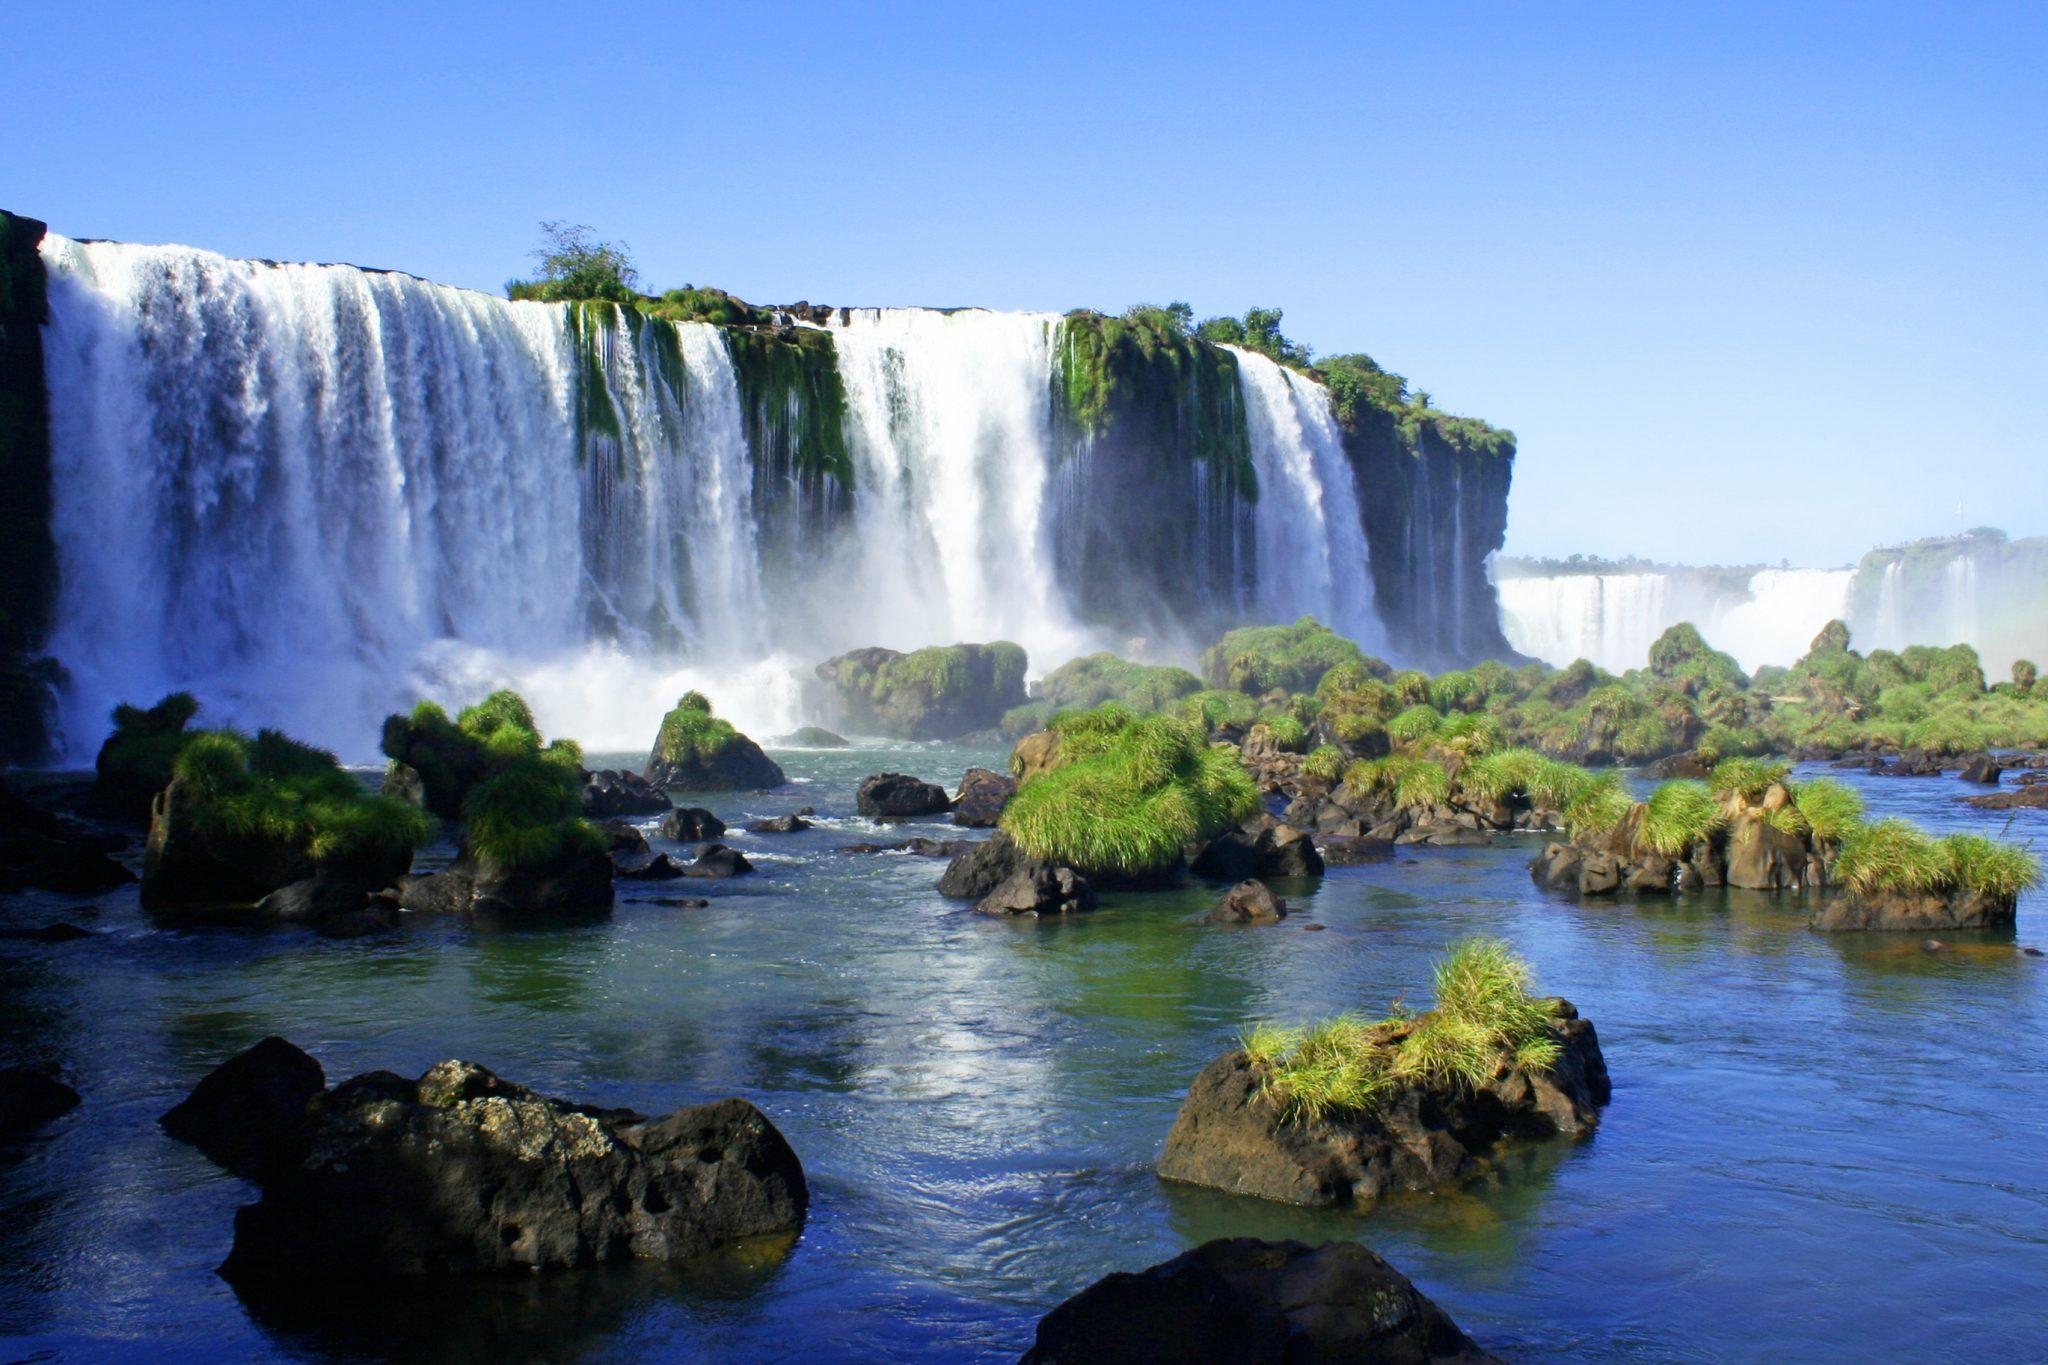 Iguazu National Park, Argentina-Brazil